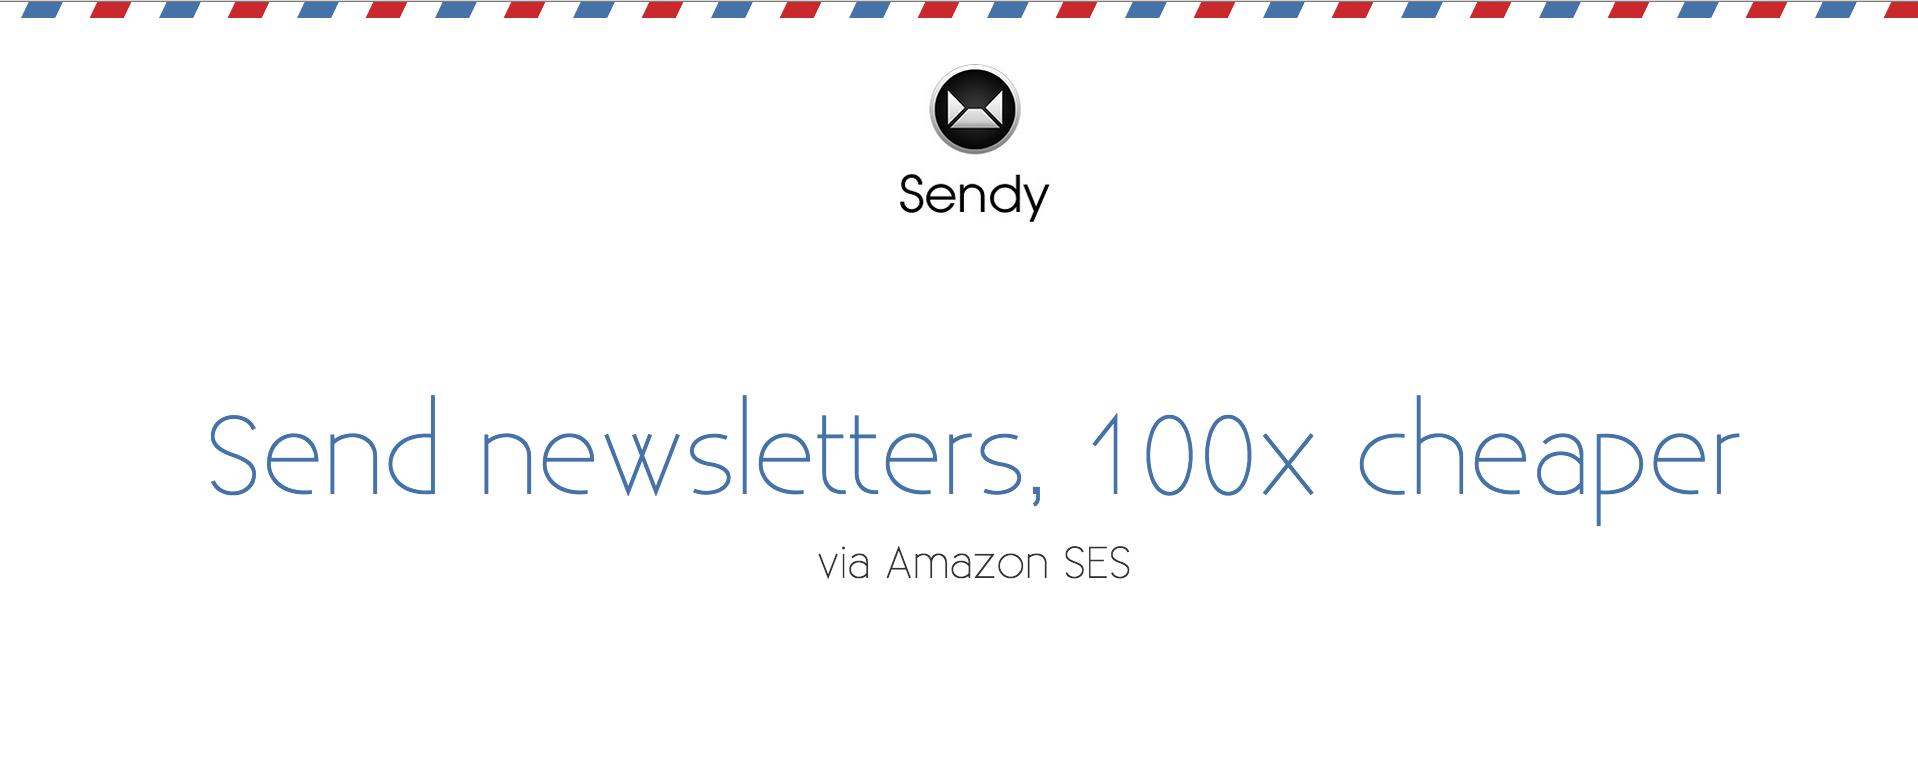 Sendy header